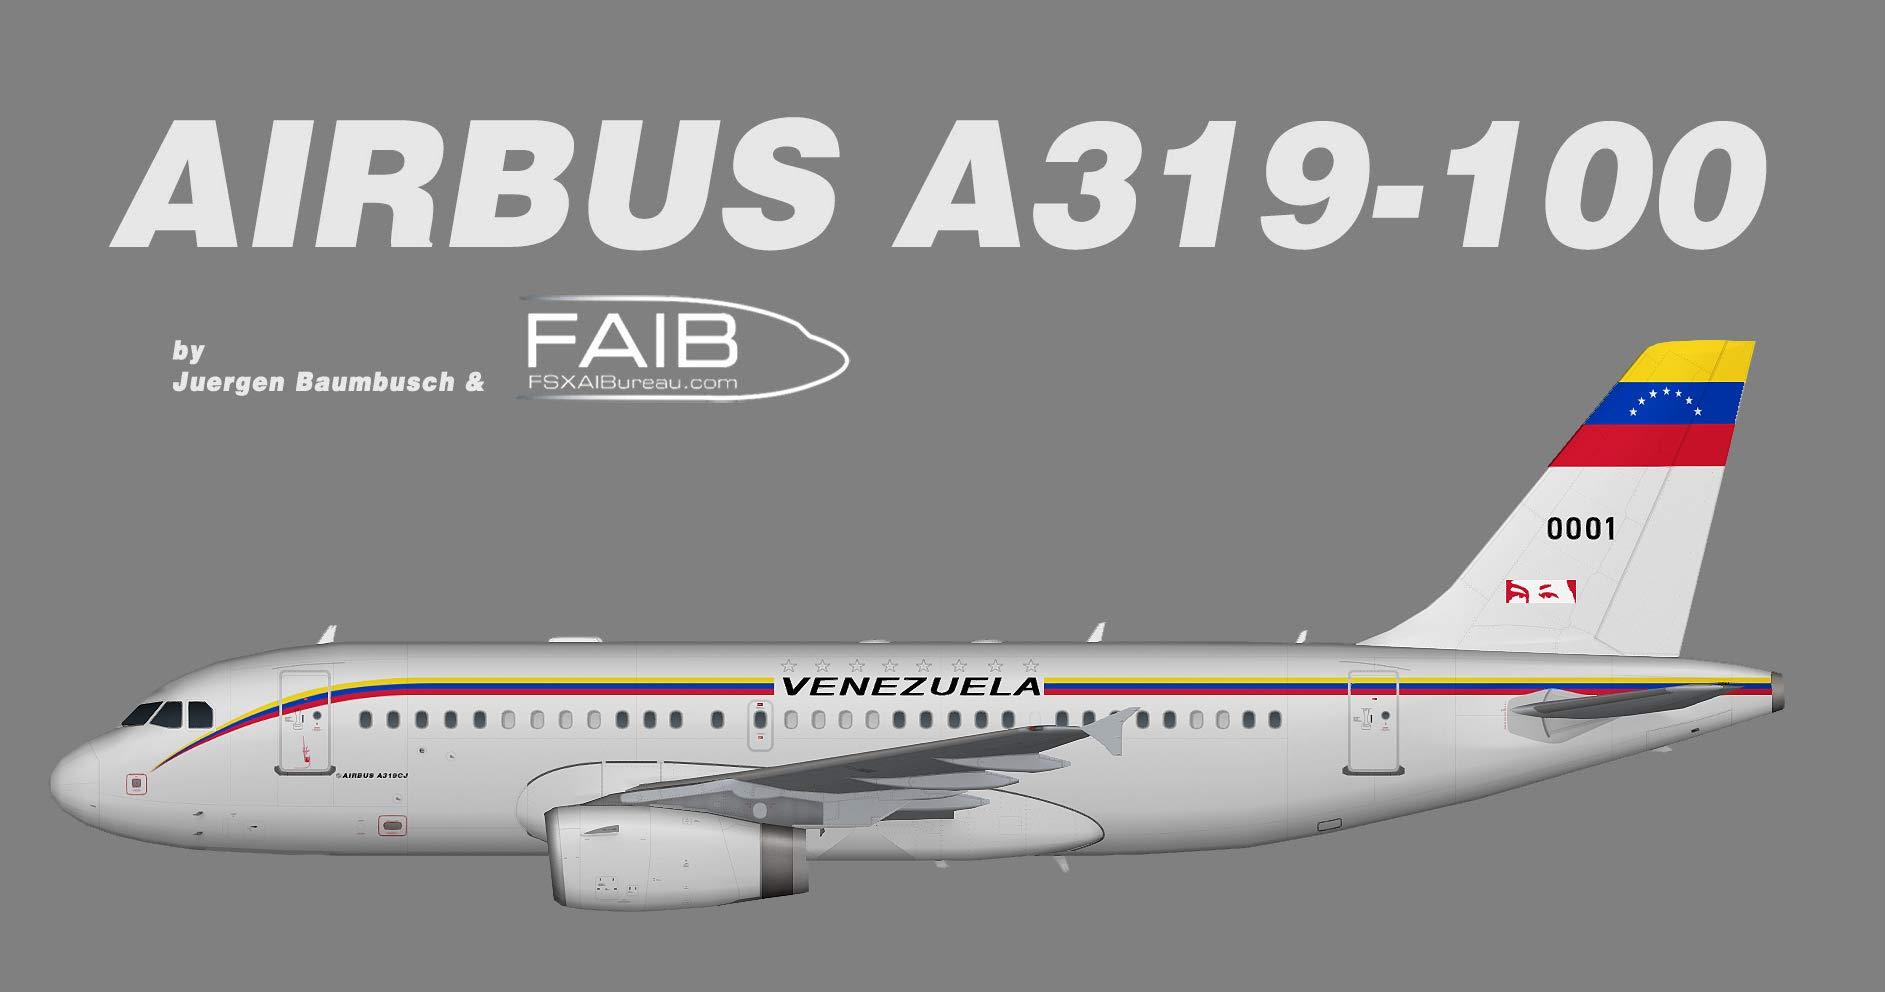 Venezuelan Government Airbus A319-100CJ VIP Transport